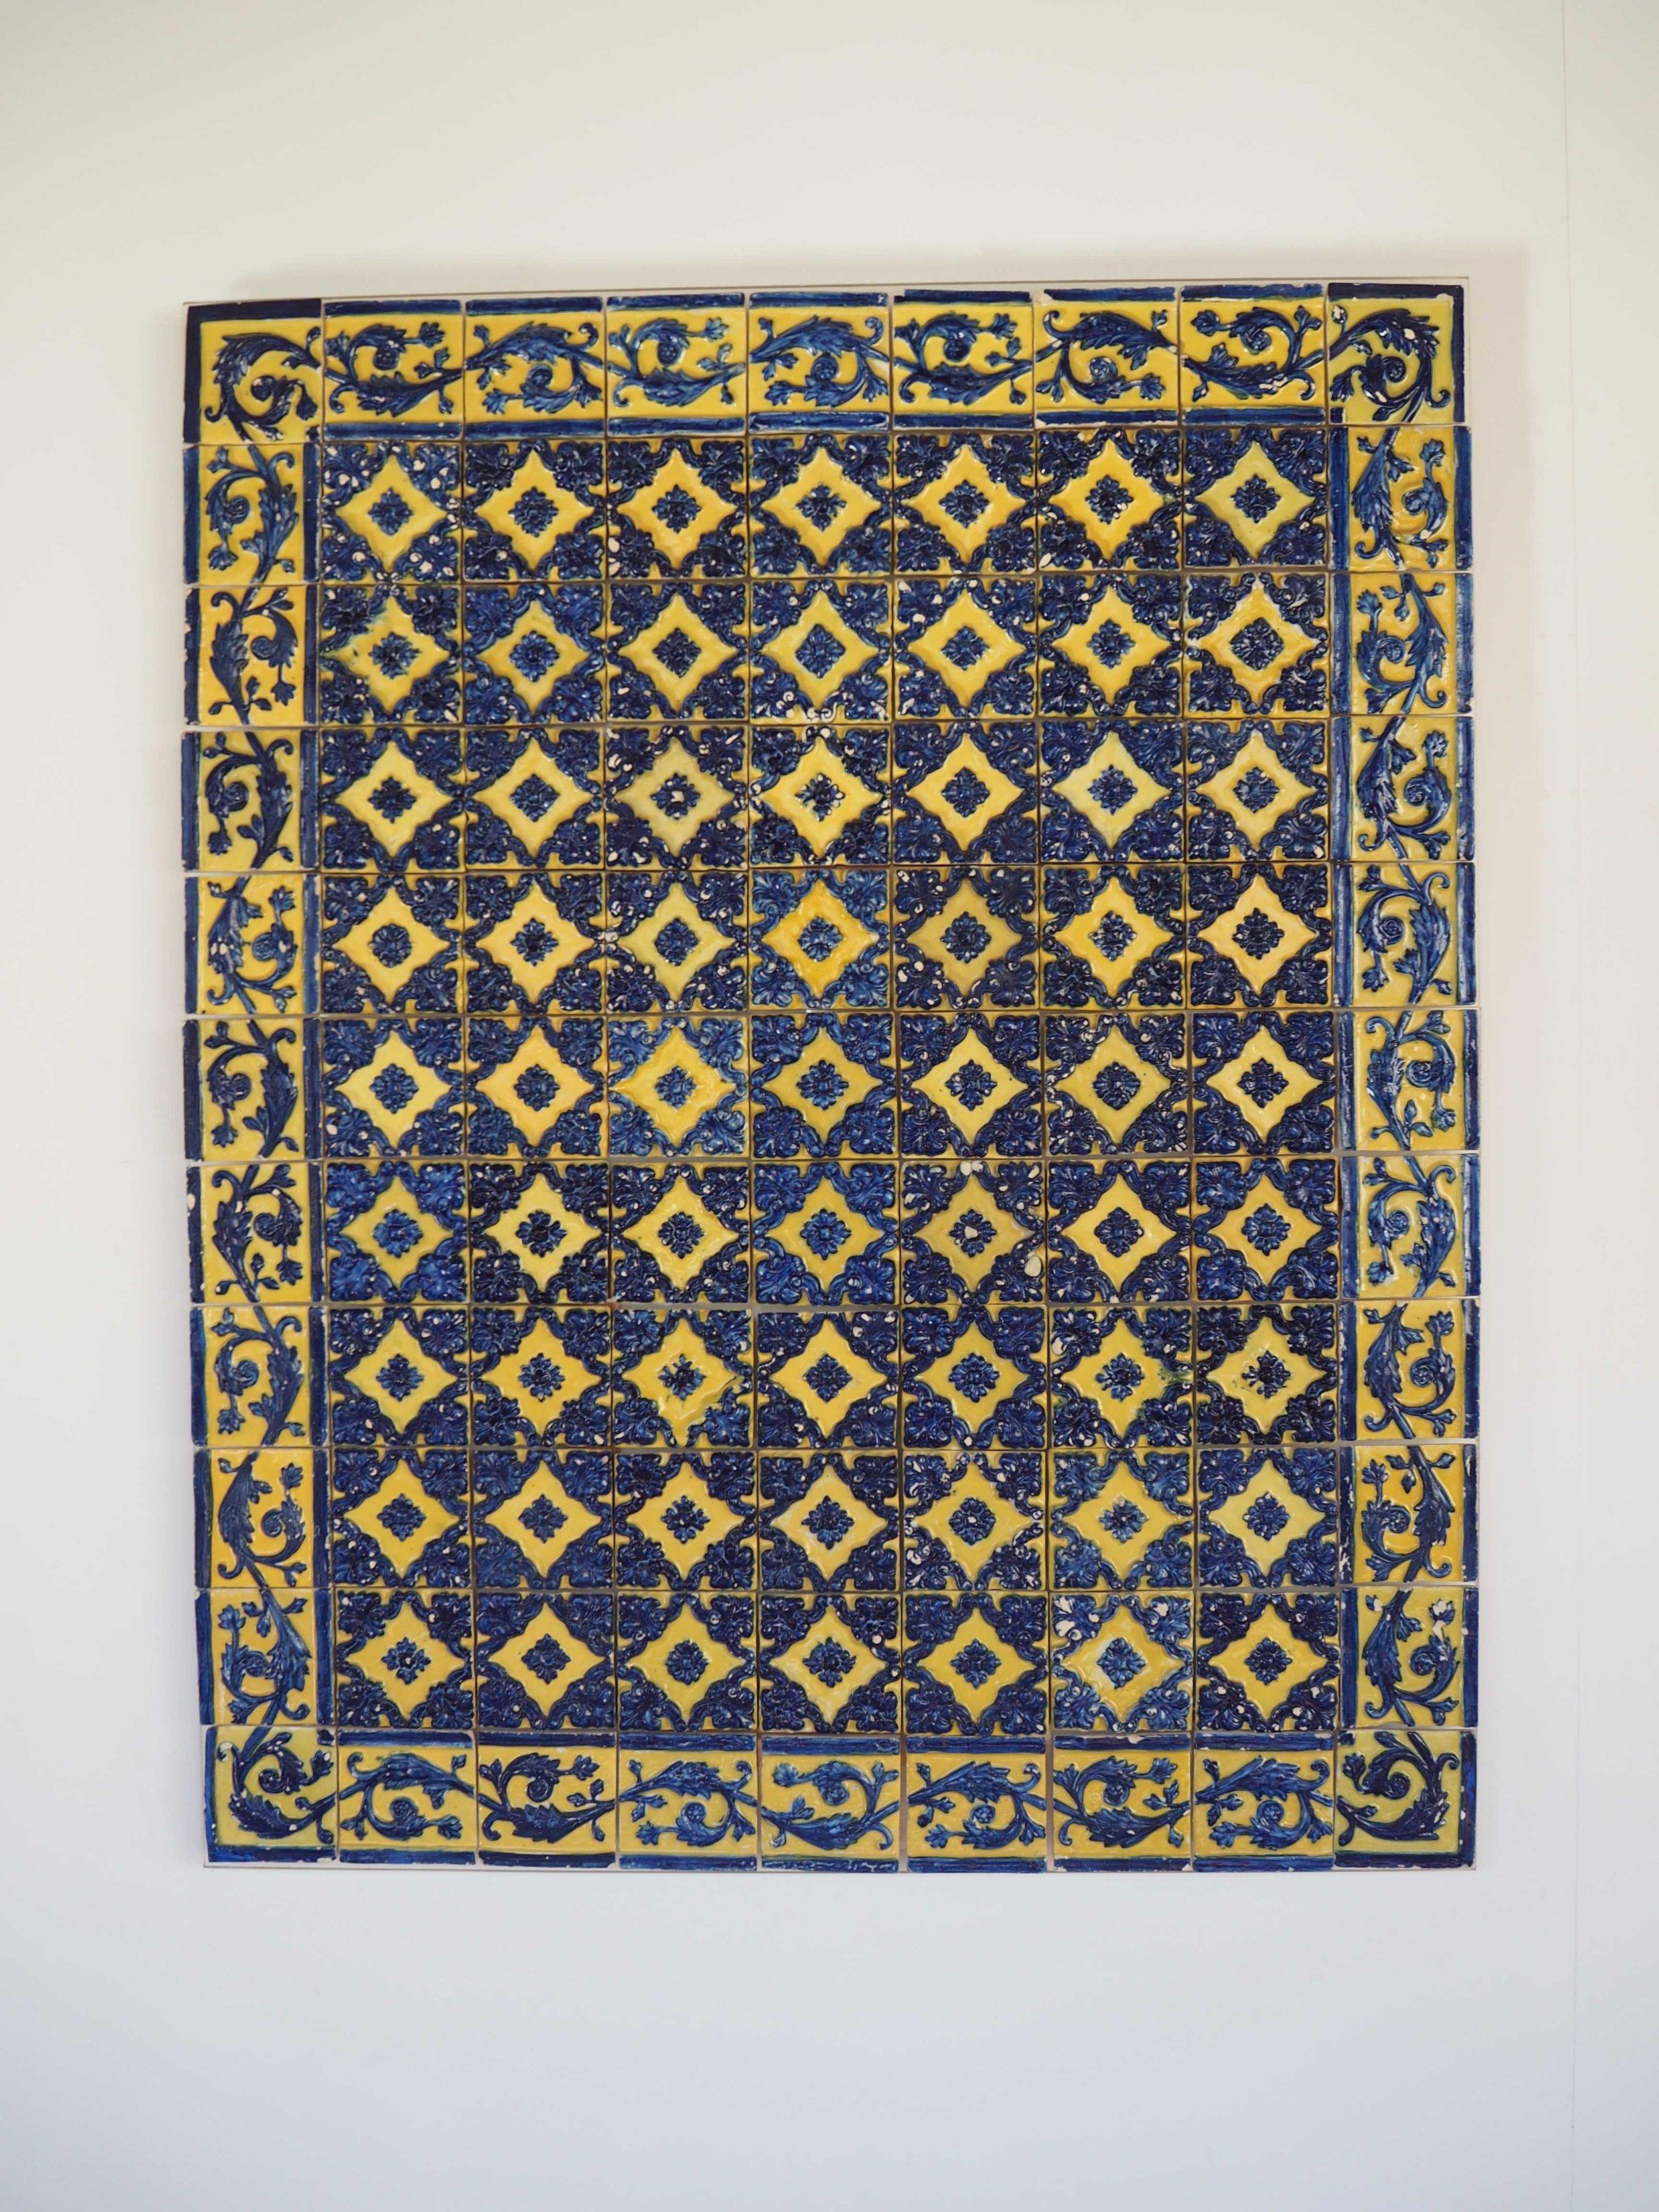 More Tiles National Tile Museum Lisbon